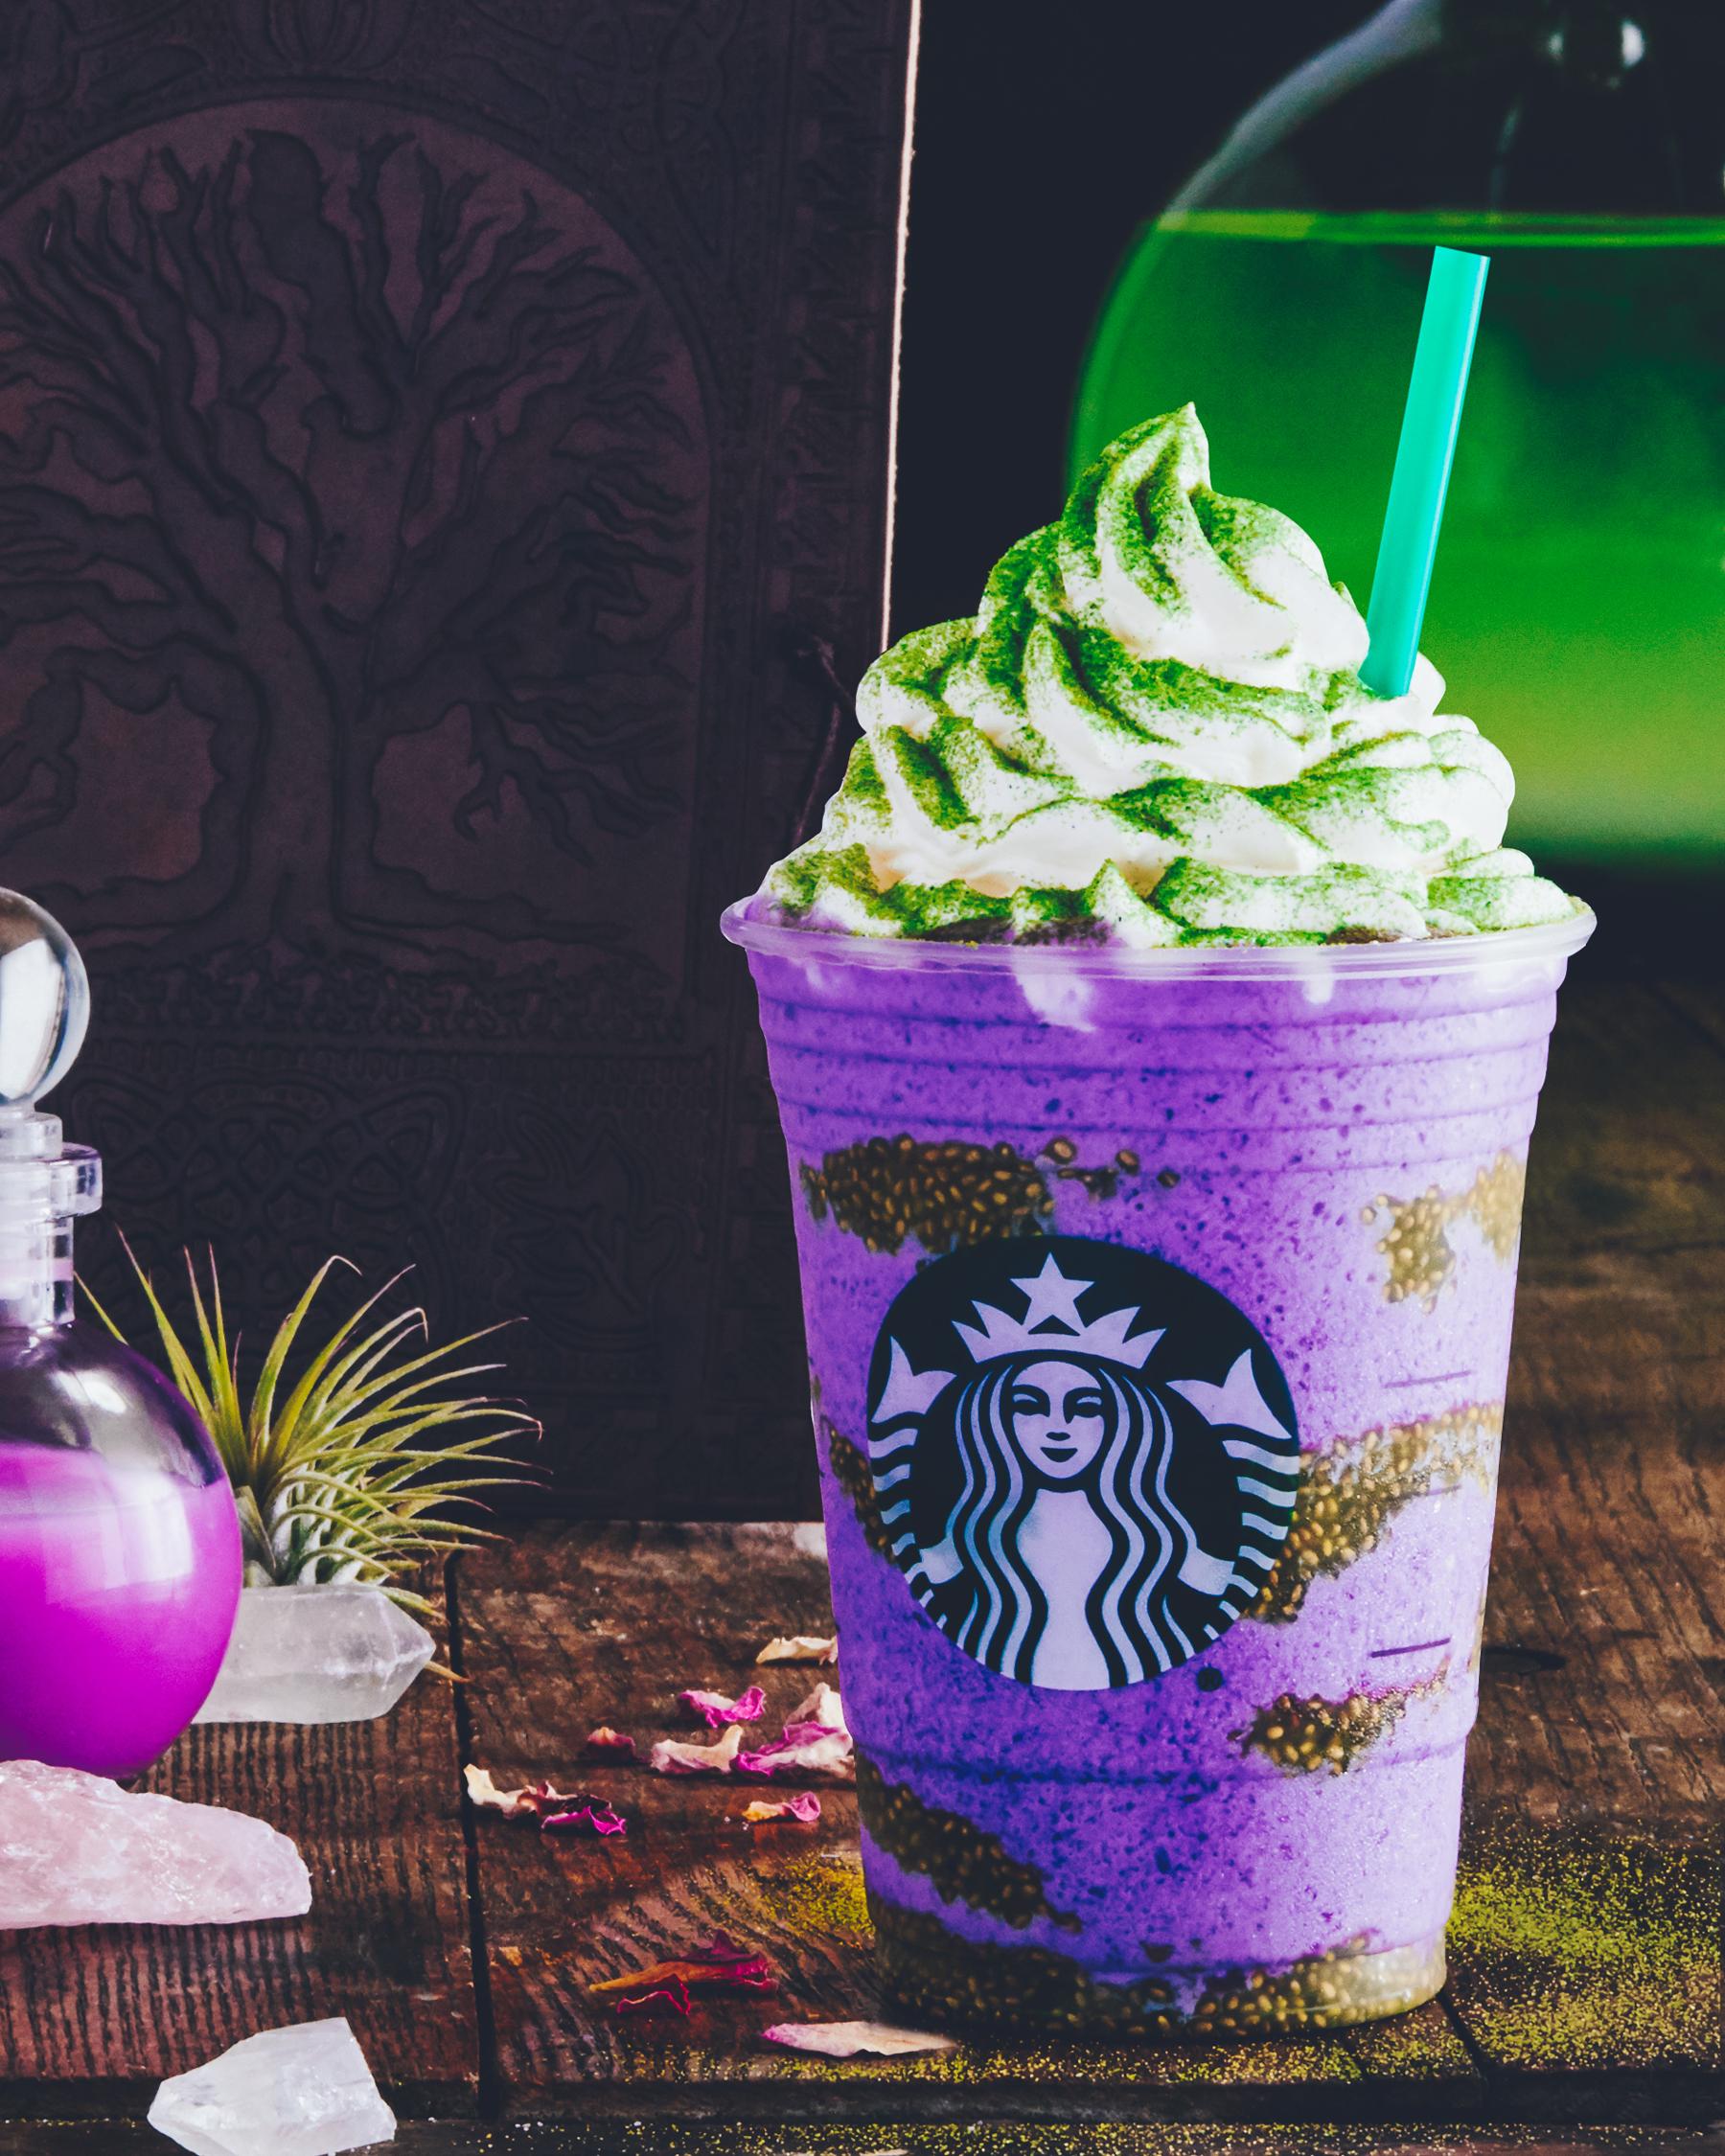 NEW at Starbucks Canada: Toad's Breath and Bat Warts?